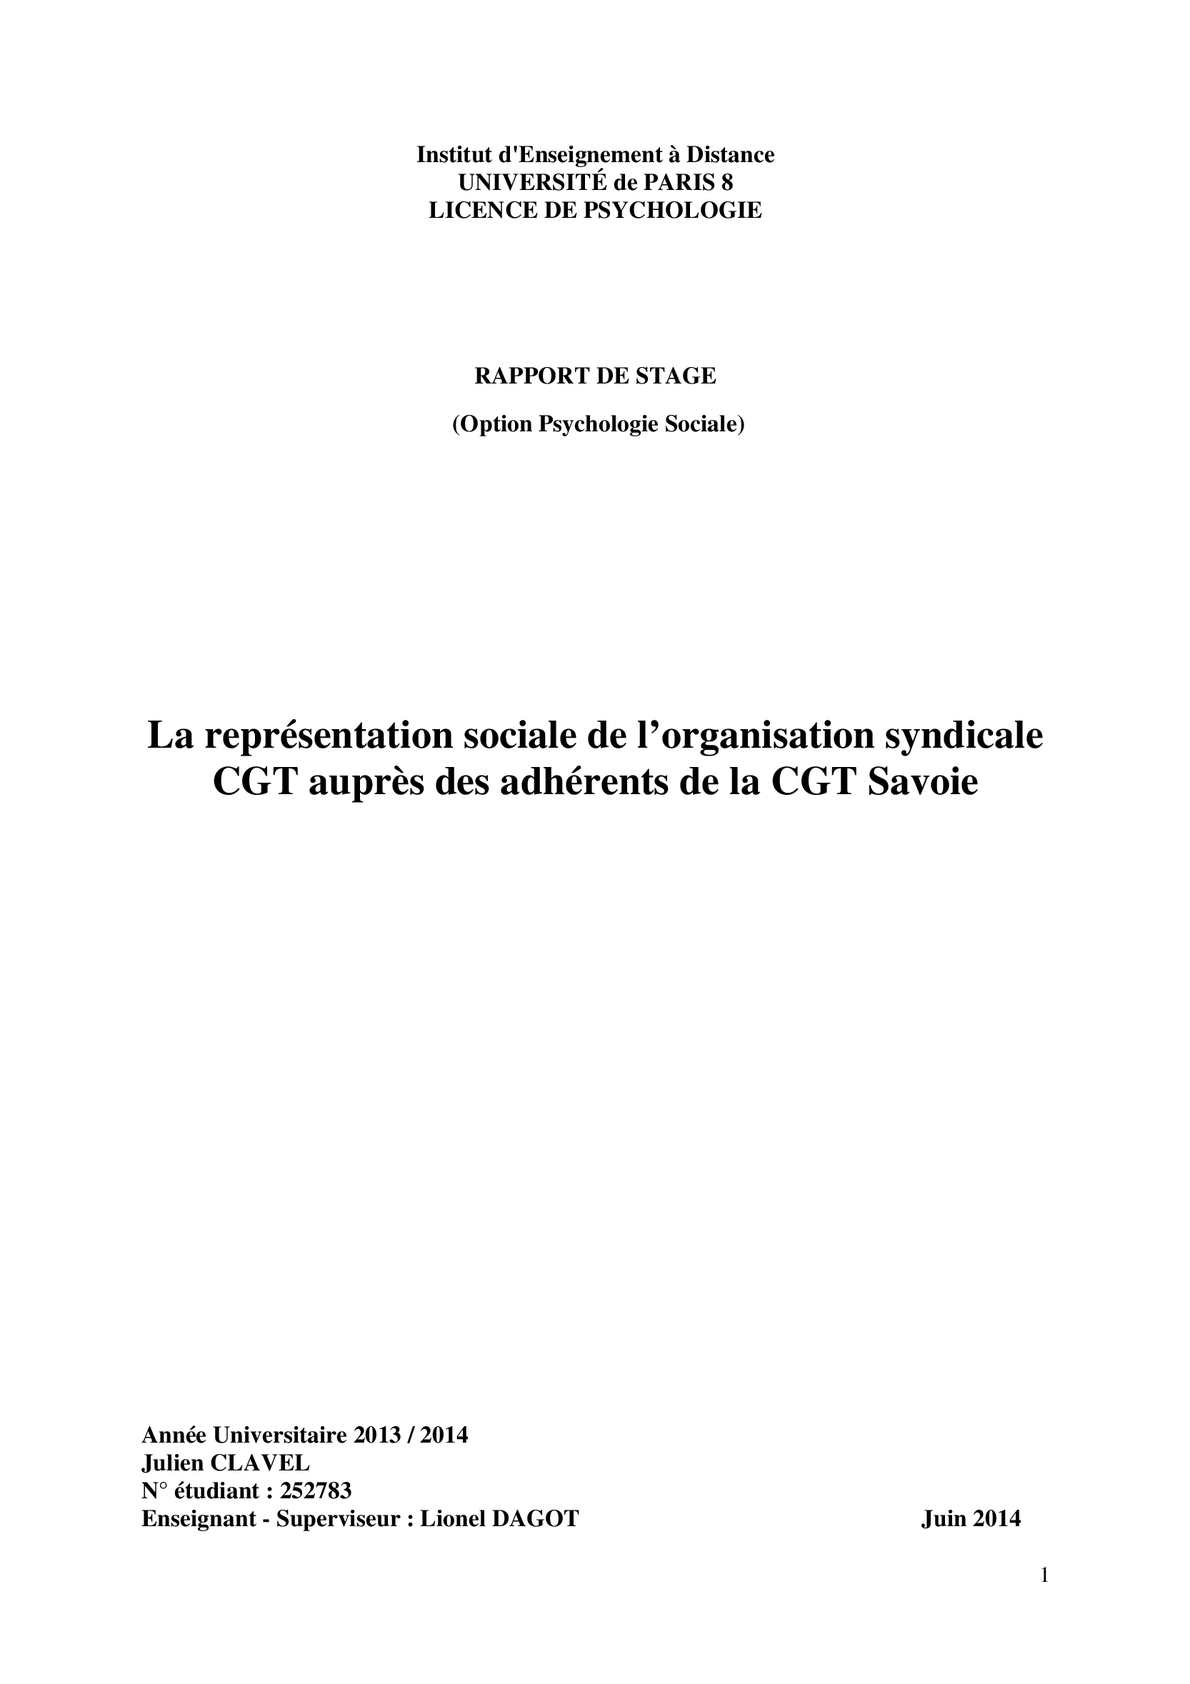 Calam o repr sentation sociale rapport de stage cgt 73 - Page de garde rapport de stage open office ...